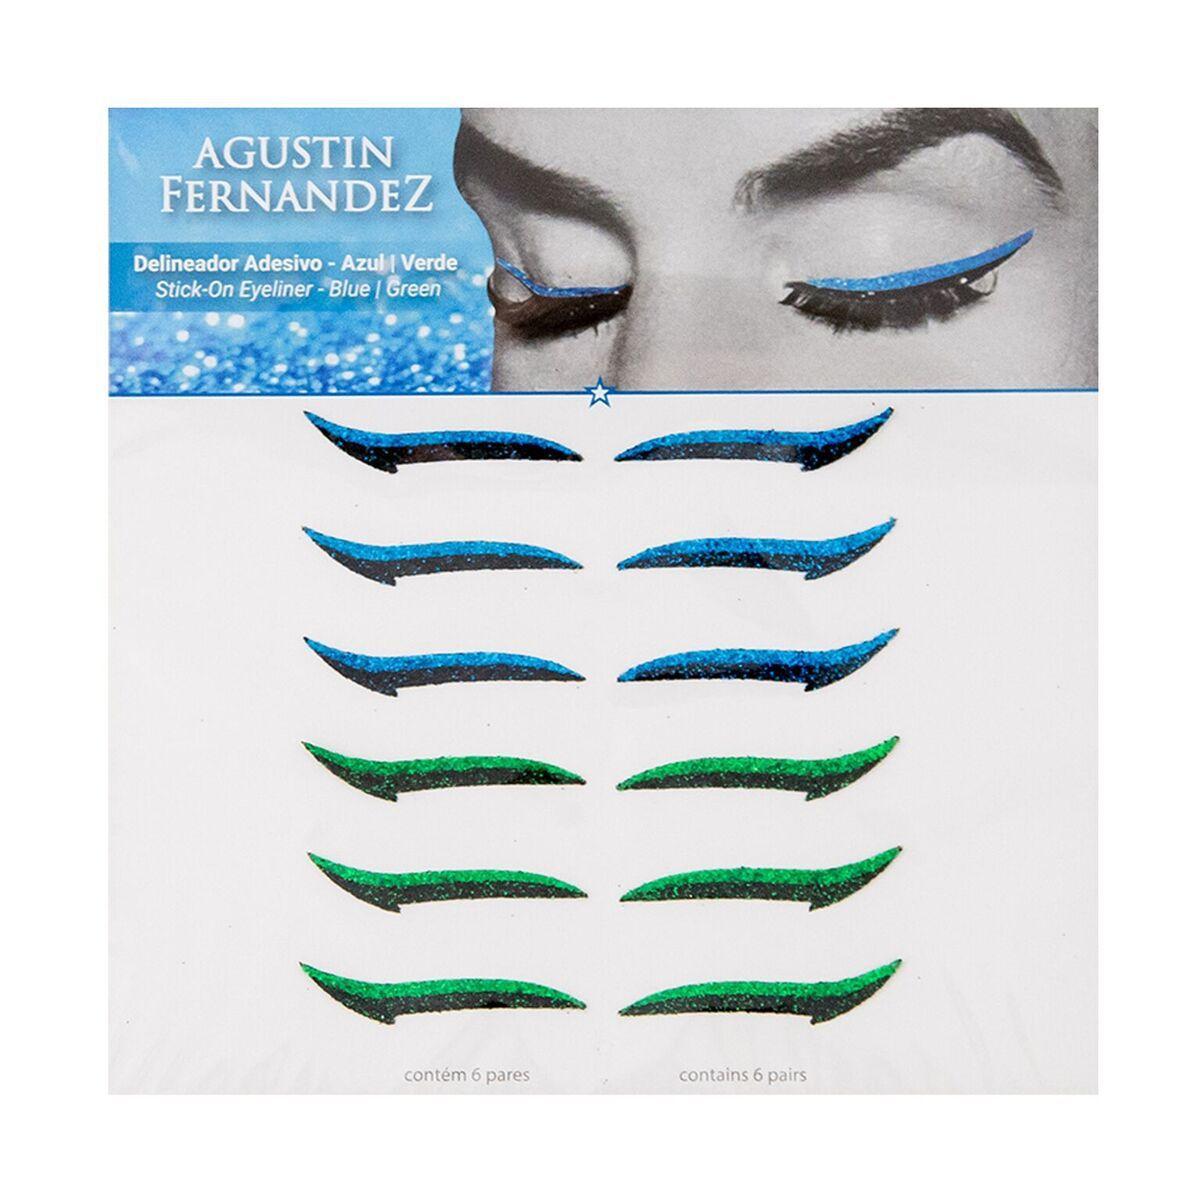 Delineador Adesivo modelo Clássico Color Blue/Green